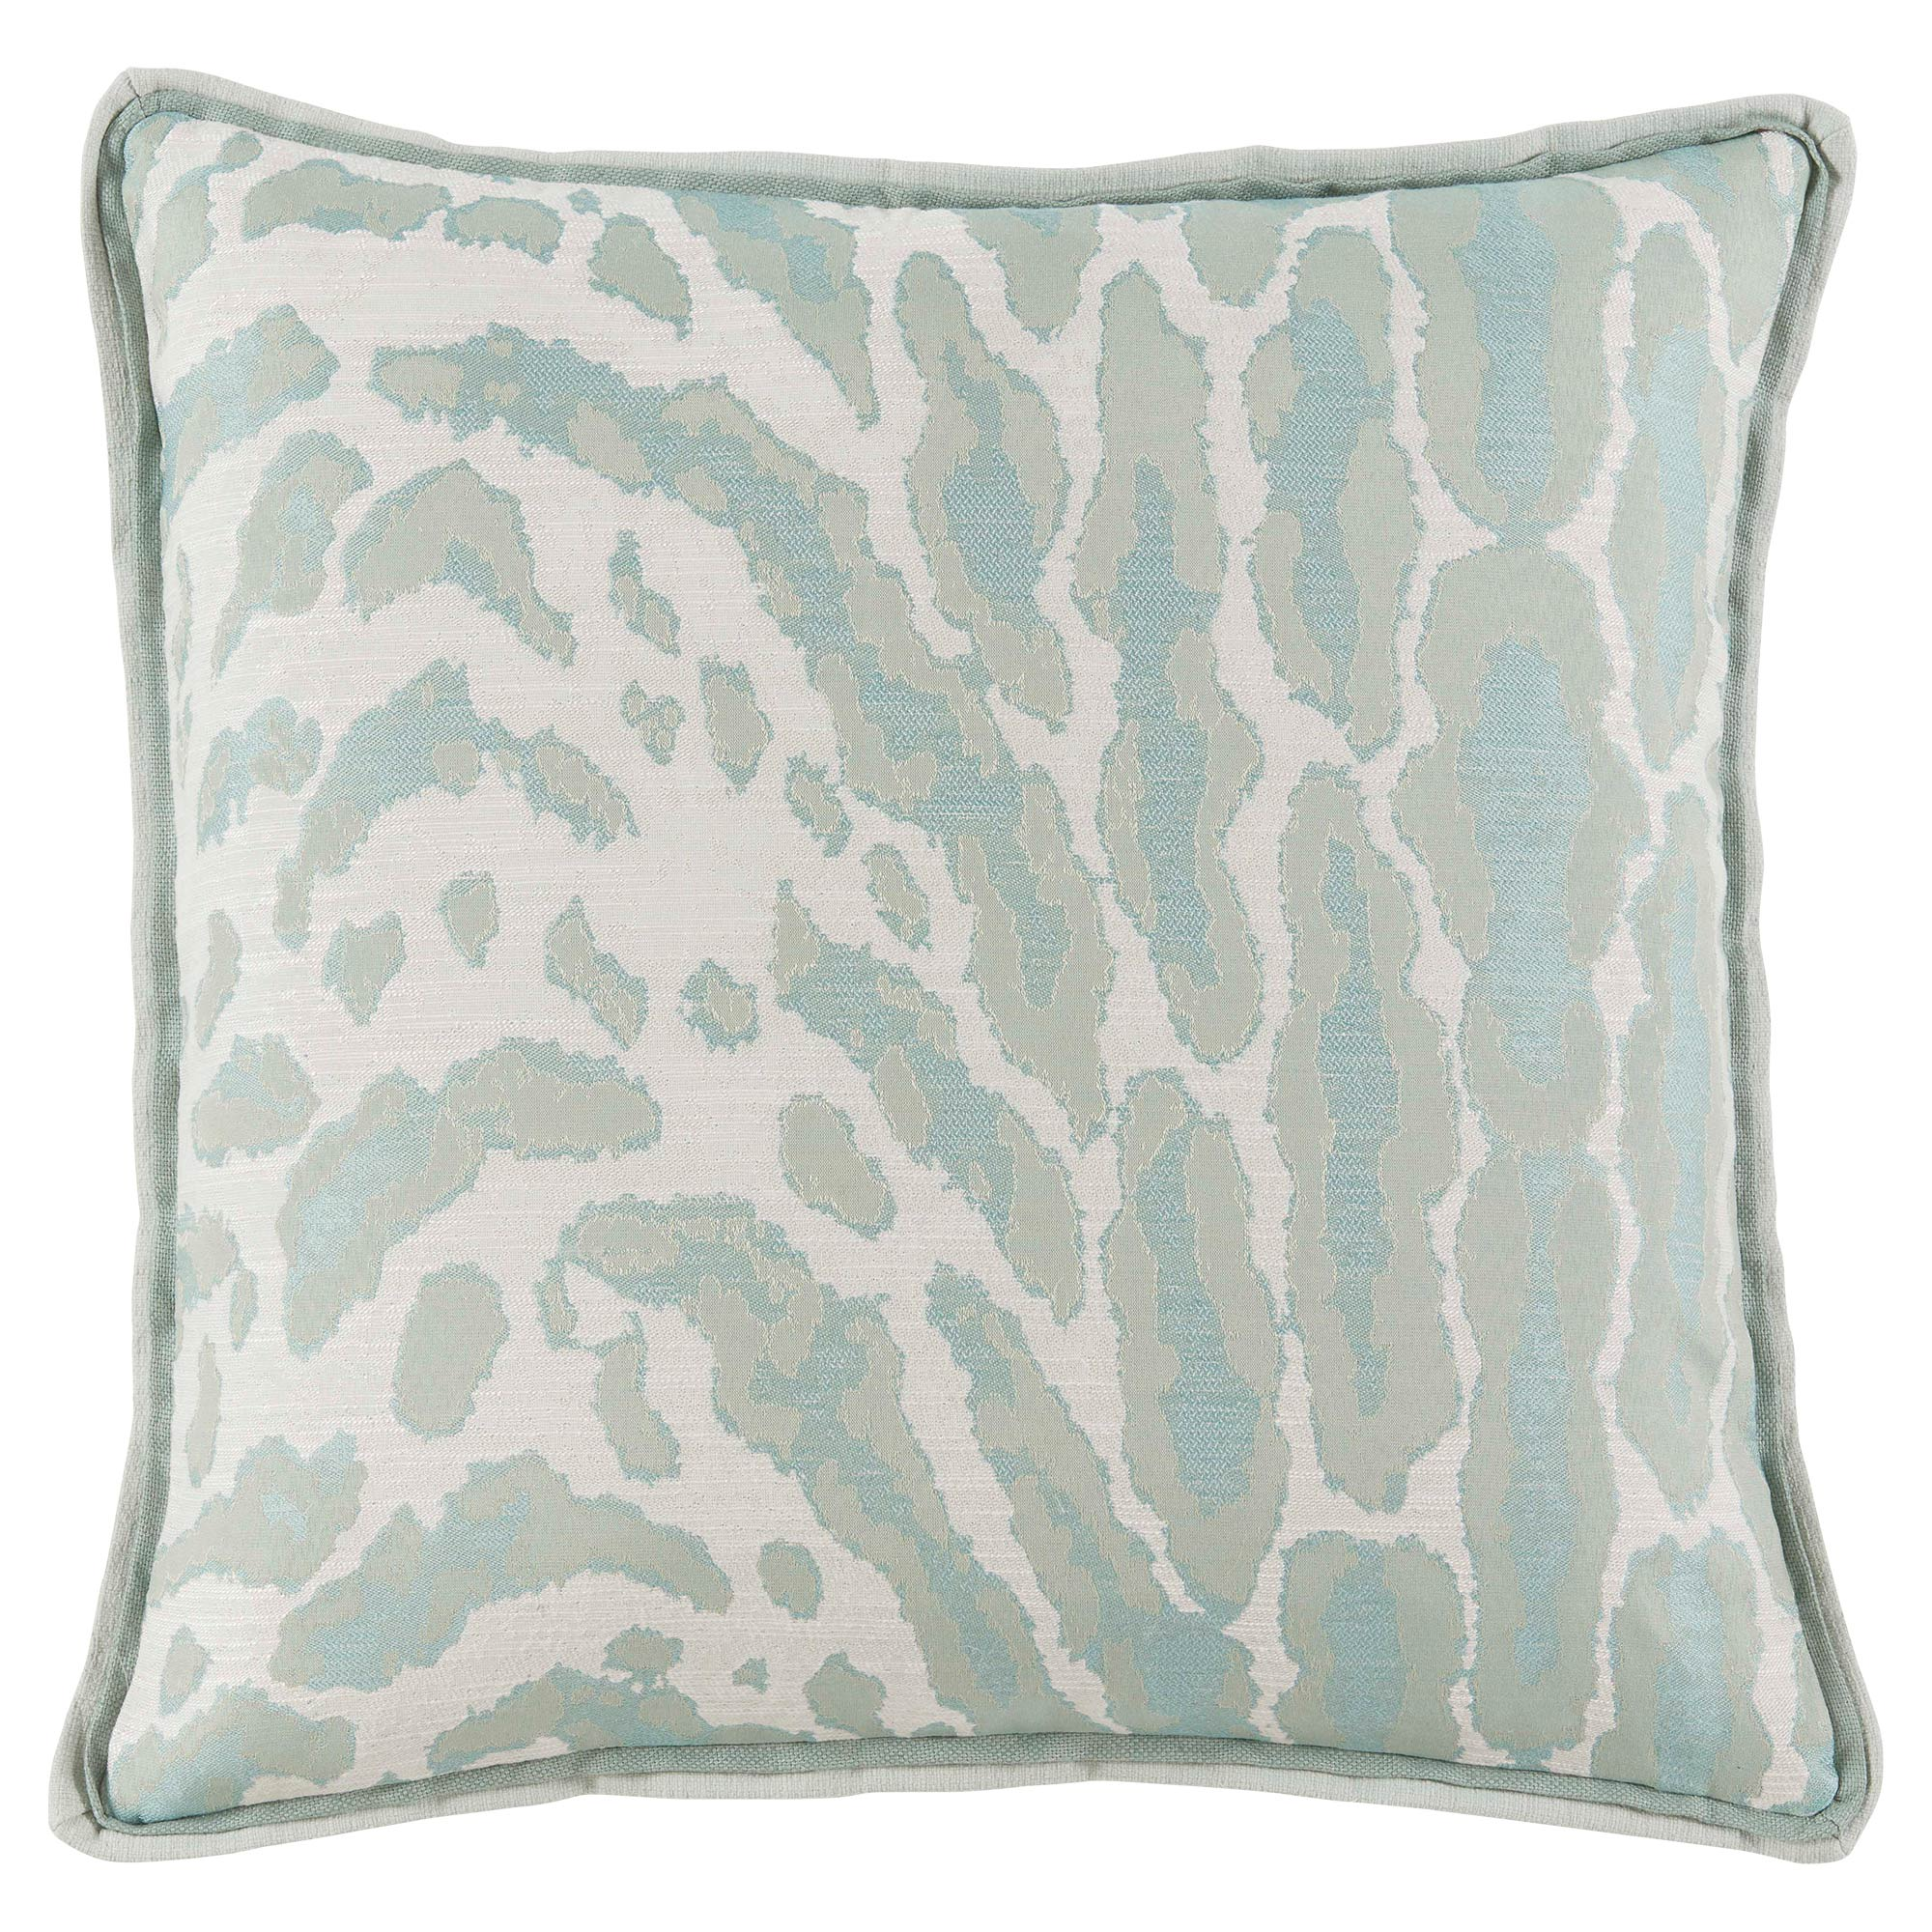 Teal Cheetah Global Bazaar Throw Pillow - 22x22